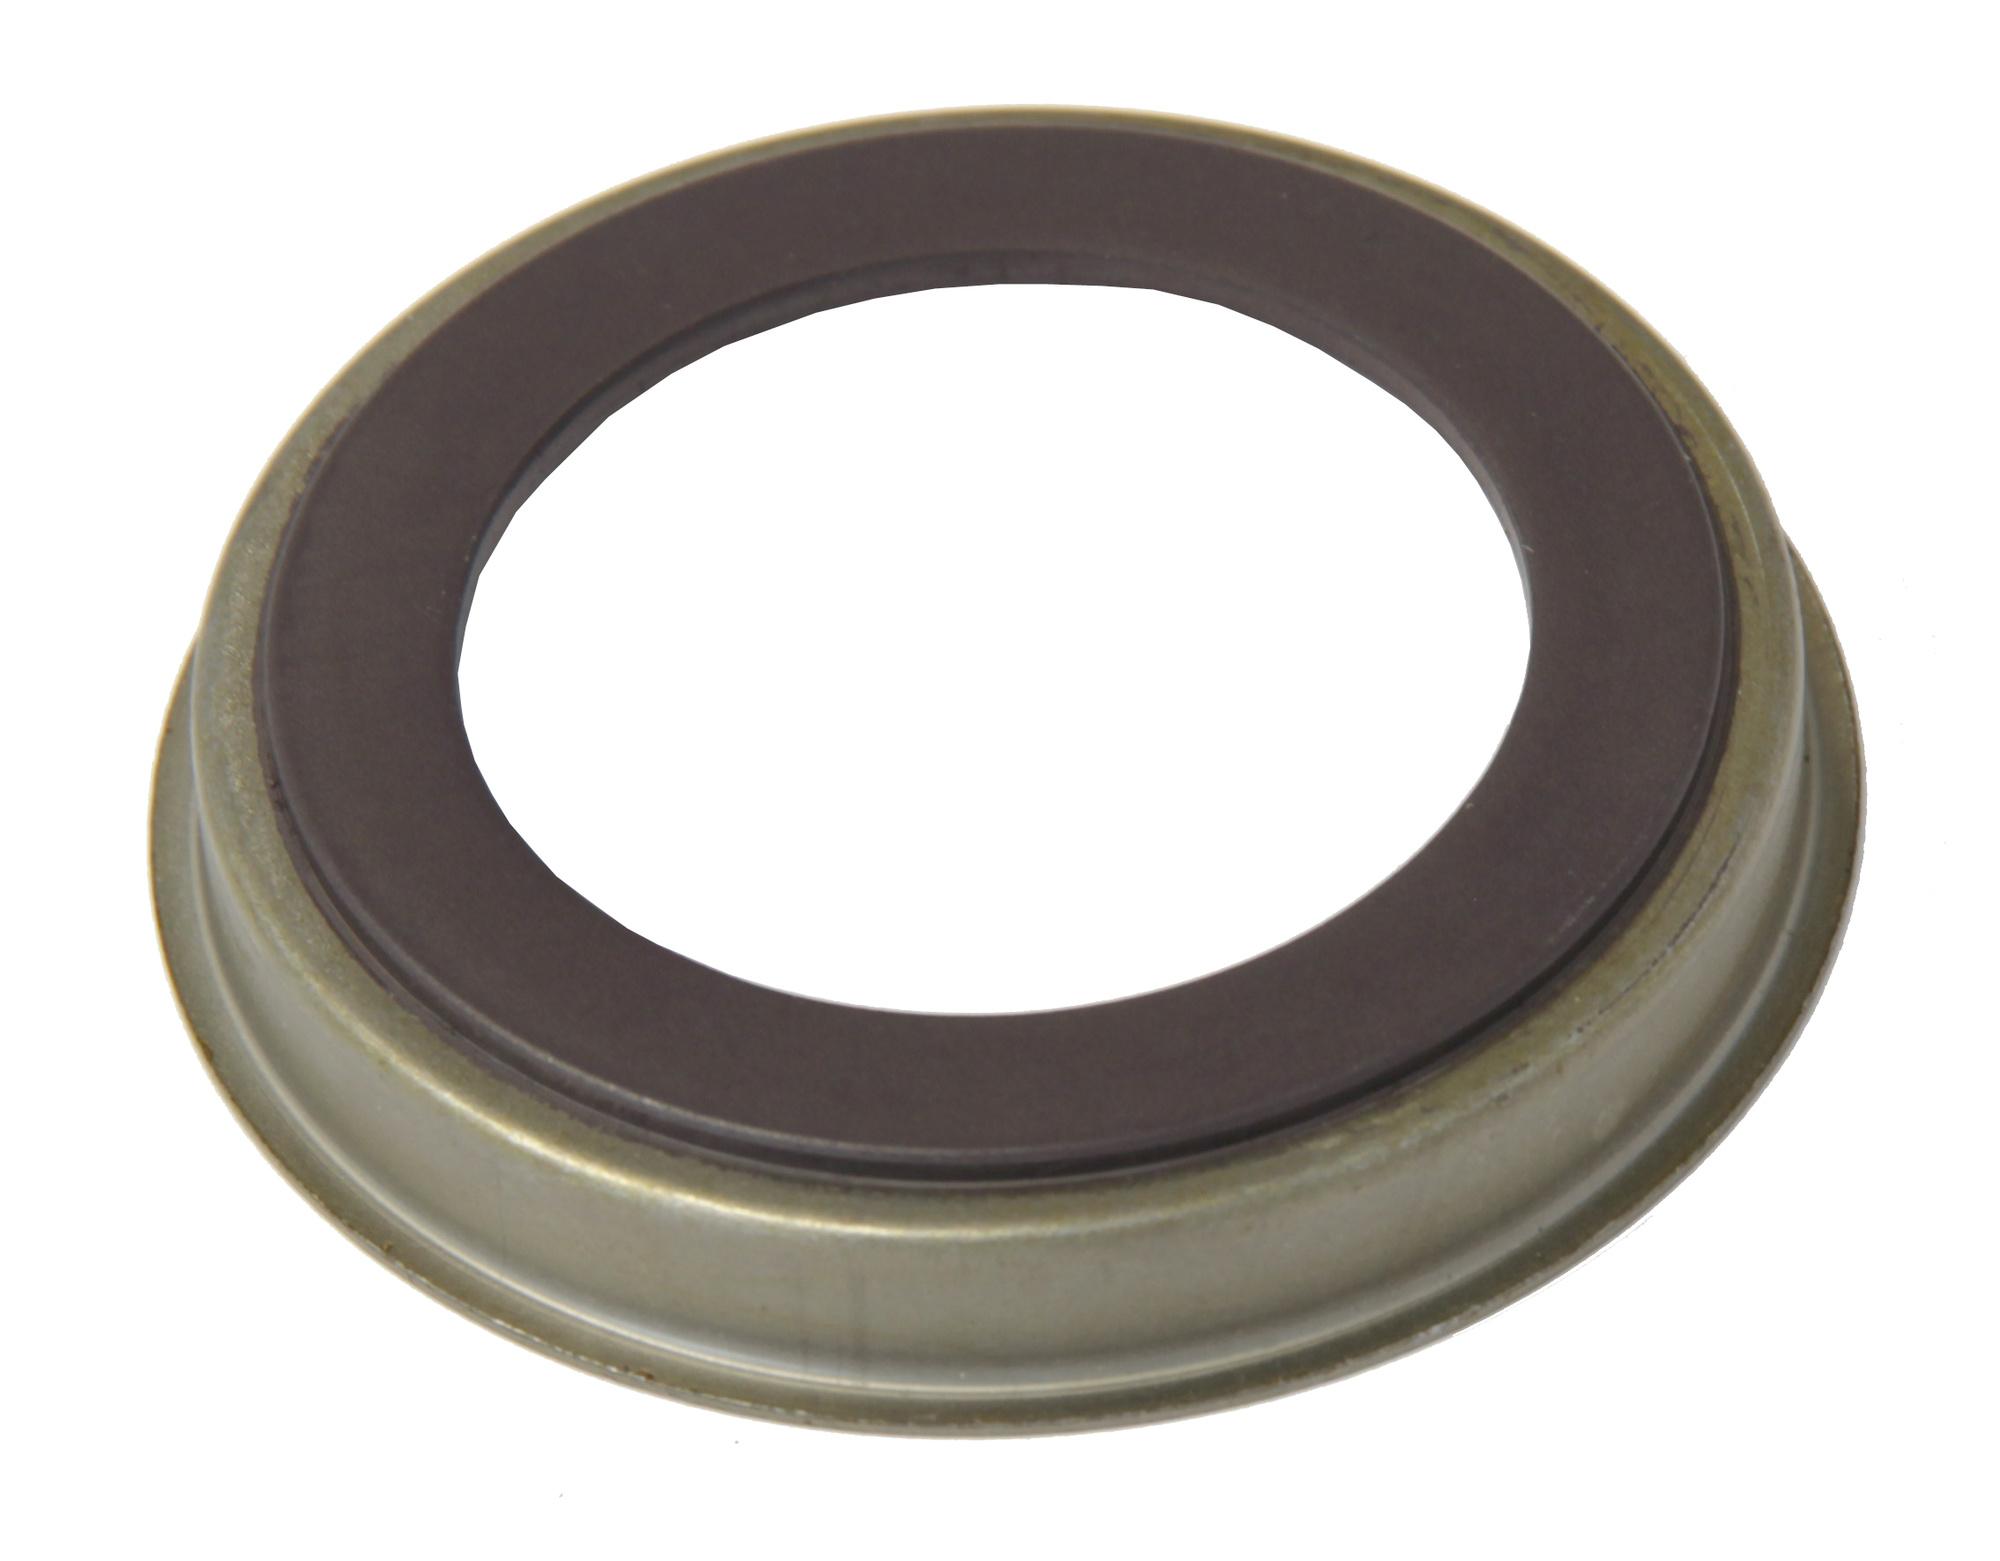 MAPCO 76708 Sensor Ring, ABS